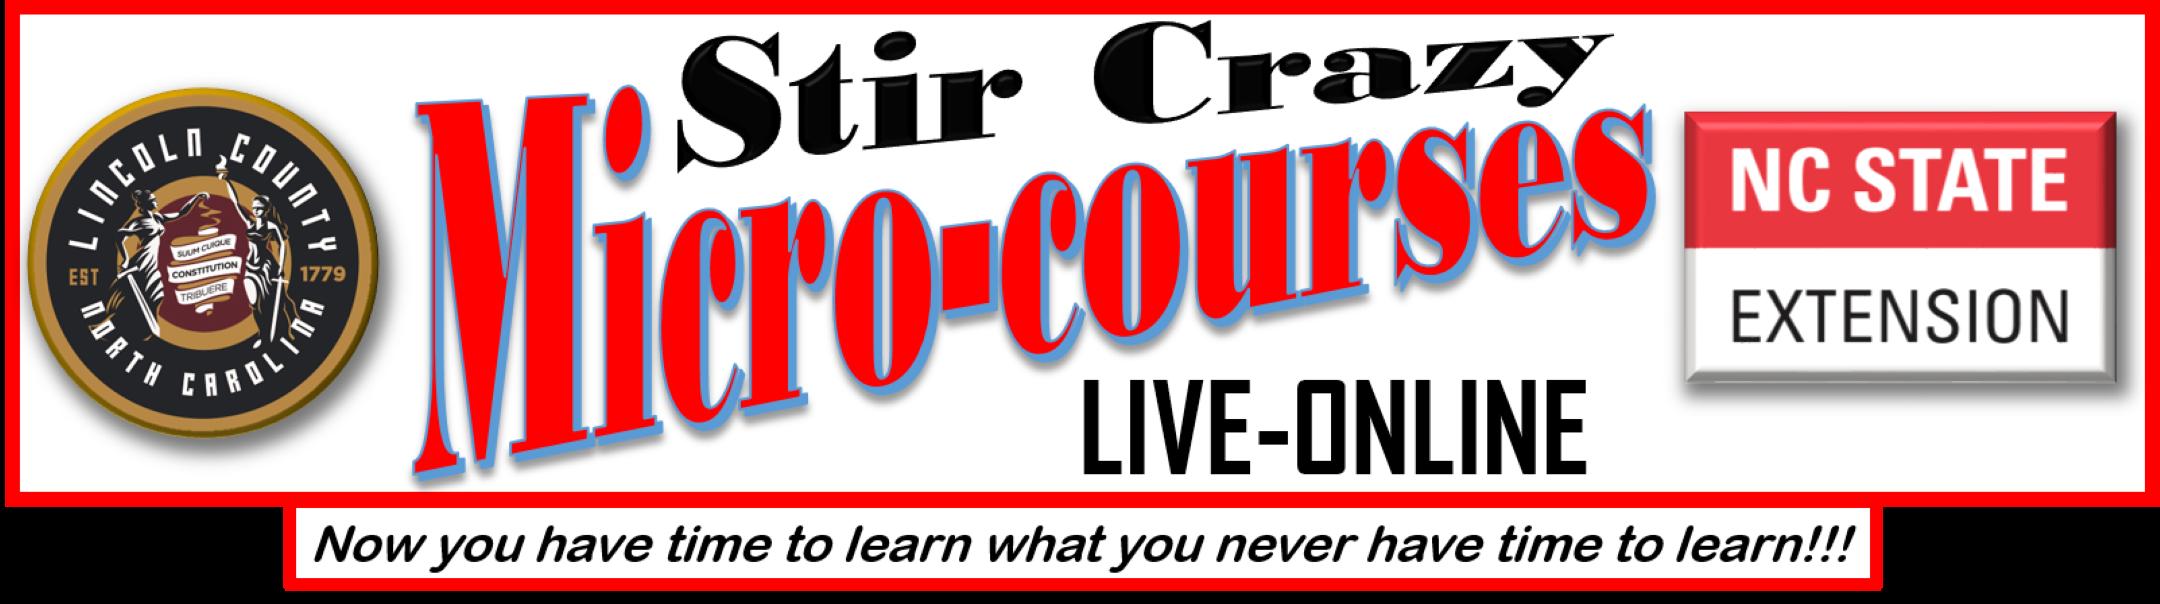 Stir Crazy Mico-Courses banner